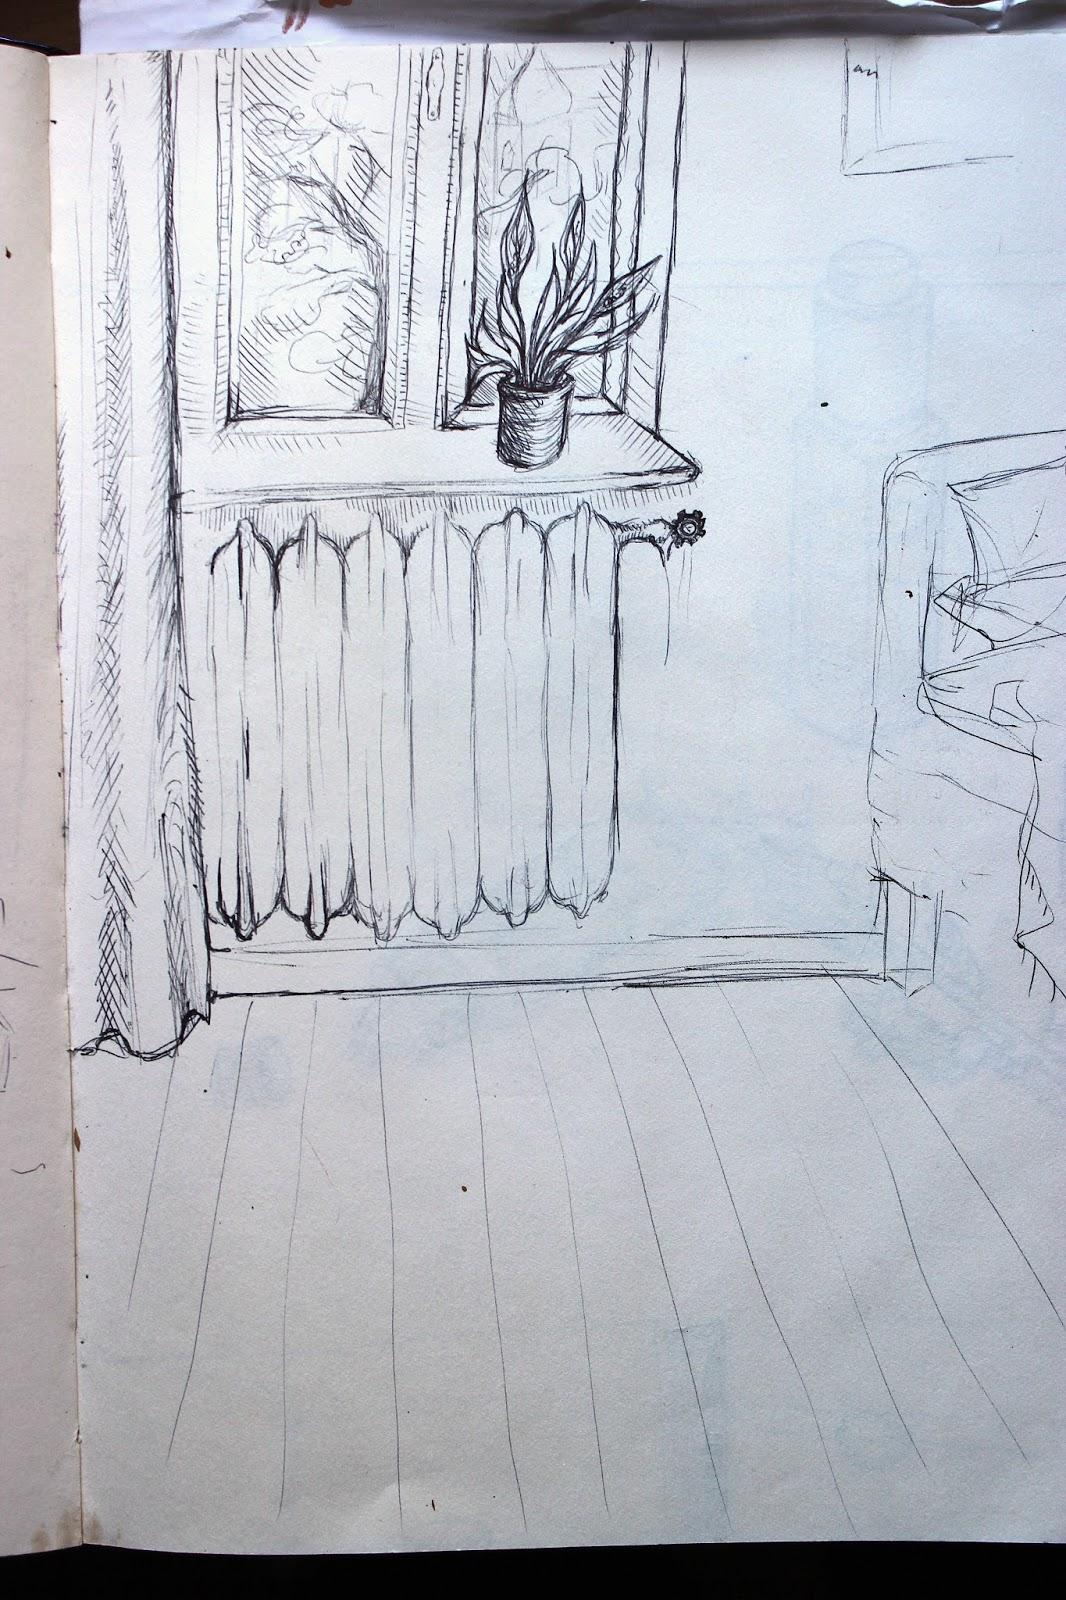 Drawing Sketch Illustration Pencil Sketchpad Notebook Bedroom Radiator